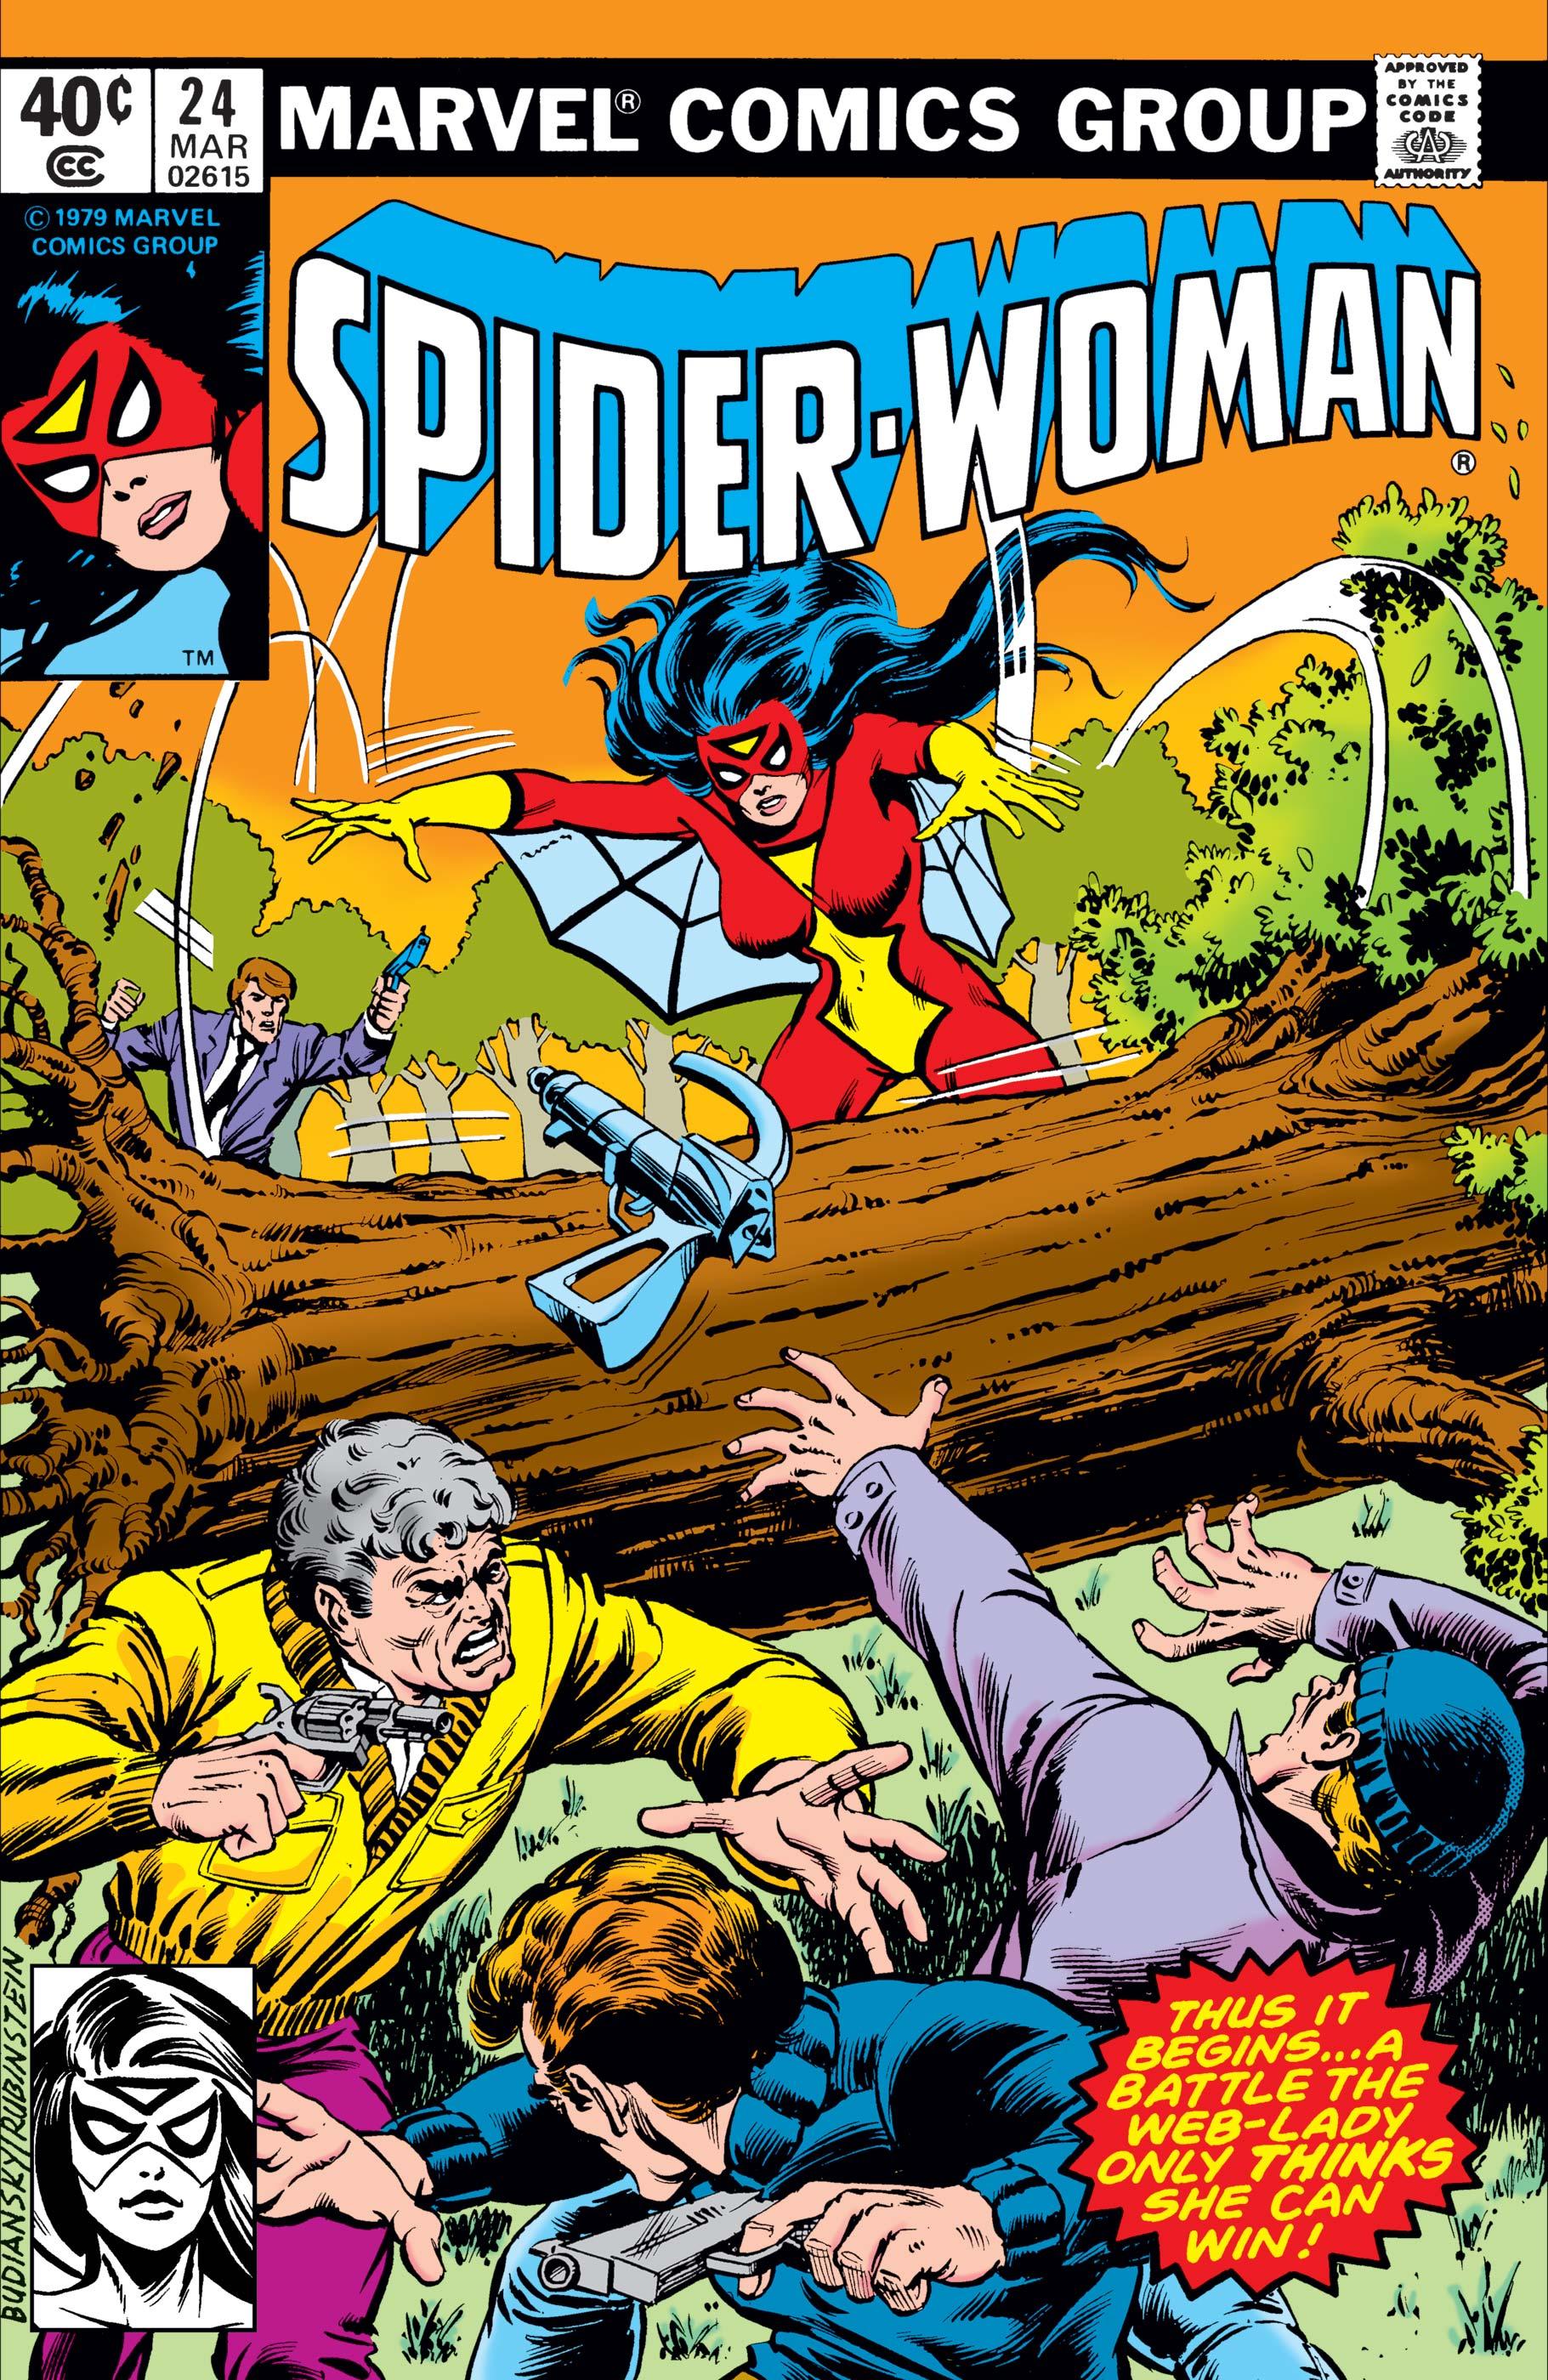 Spider-Woman (1978) #24